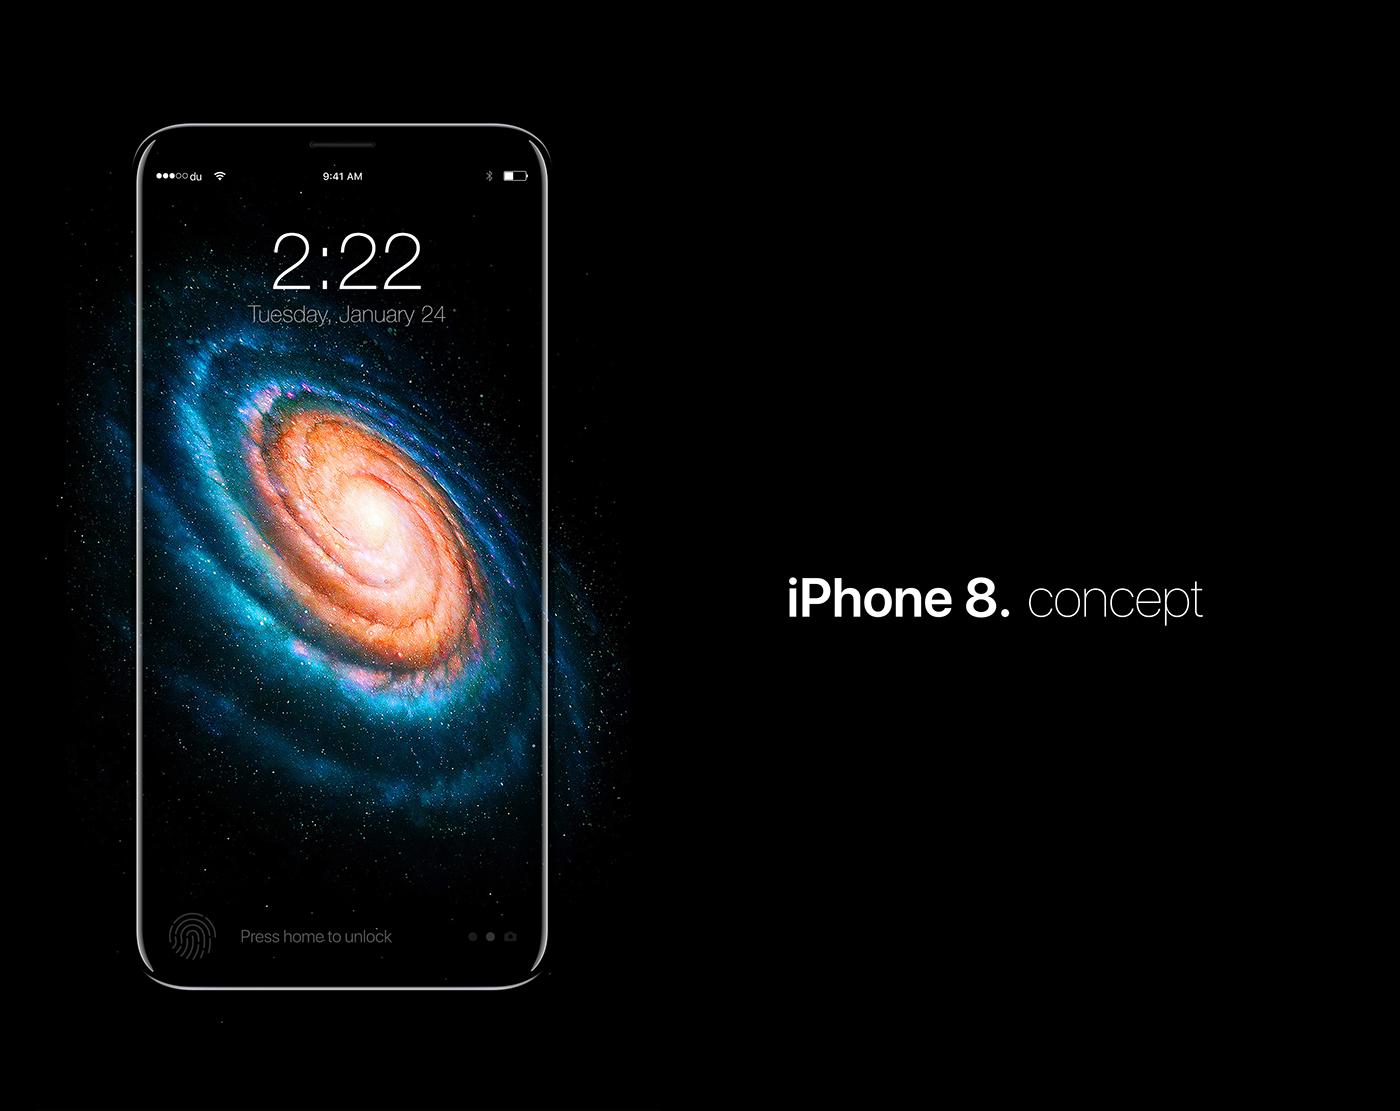 iphone 8 iphone apple iphone8 concept moeslah moe slah ios